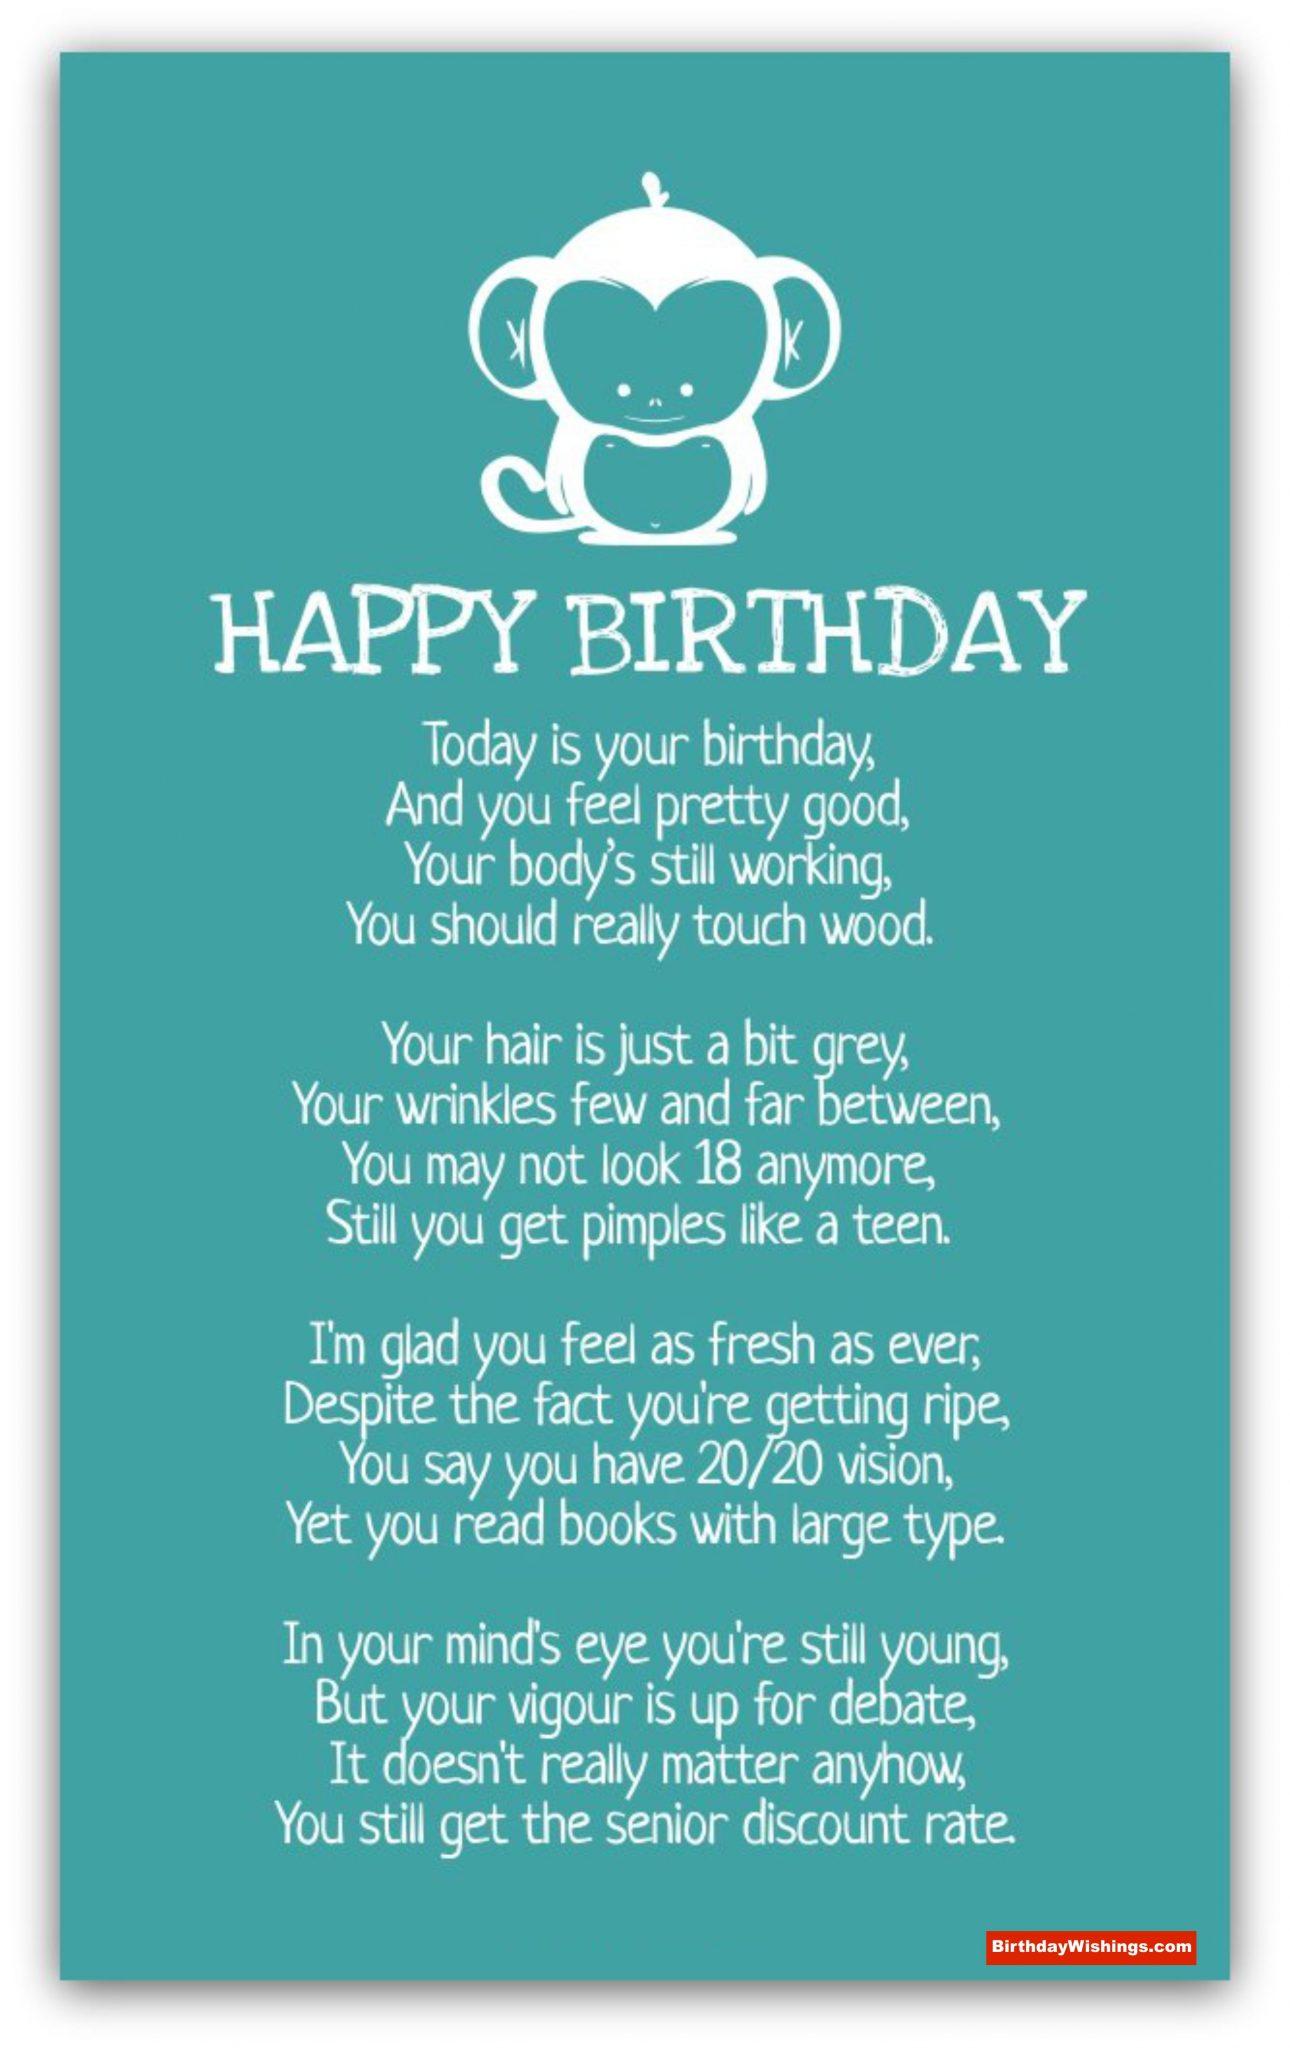 Birthday Poem For 18 Years Old Girl - BirthdayWishings.com